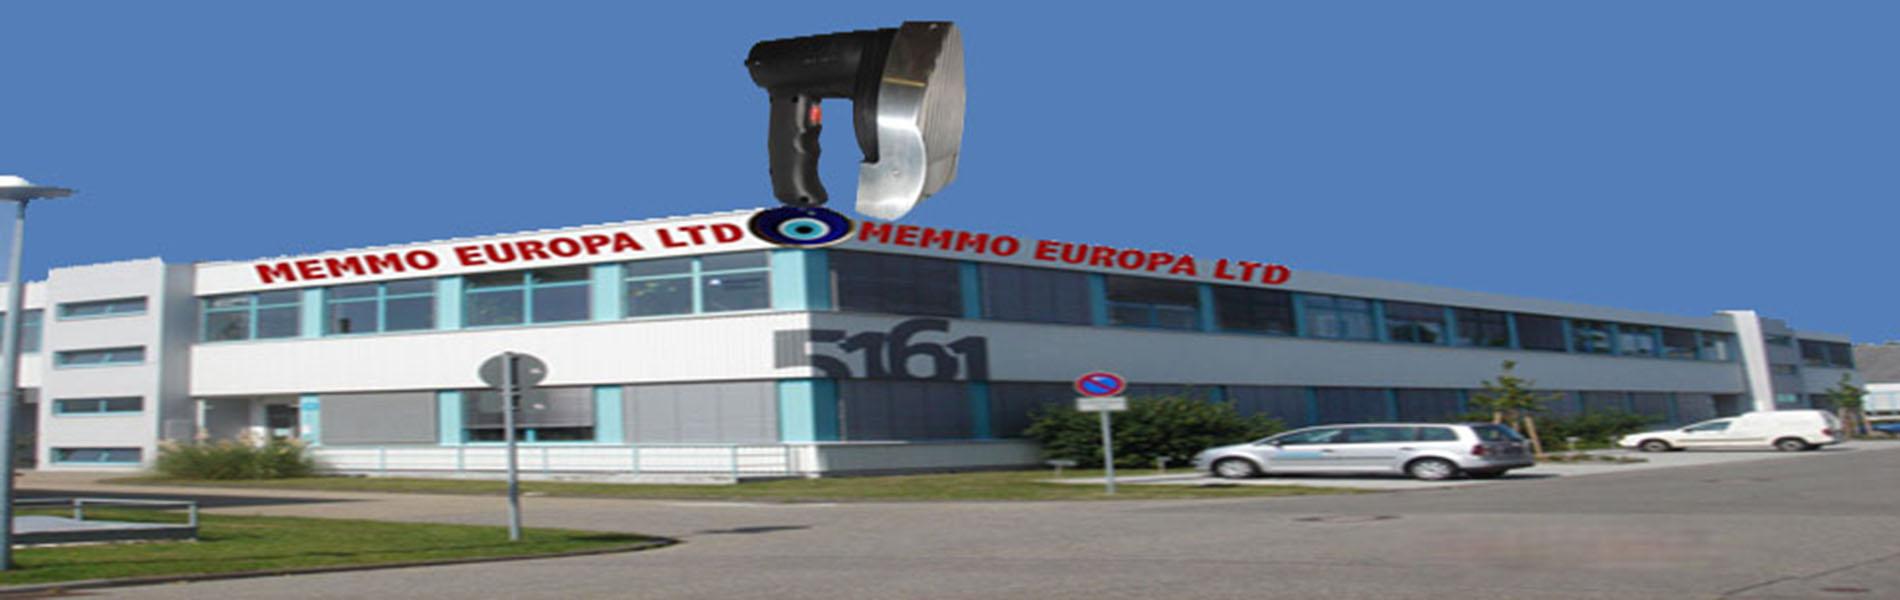 Memmo LTD